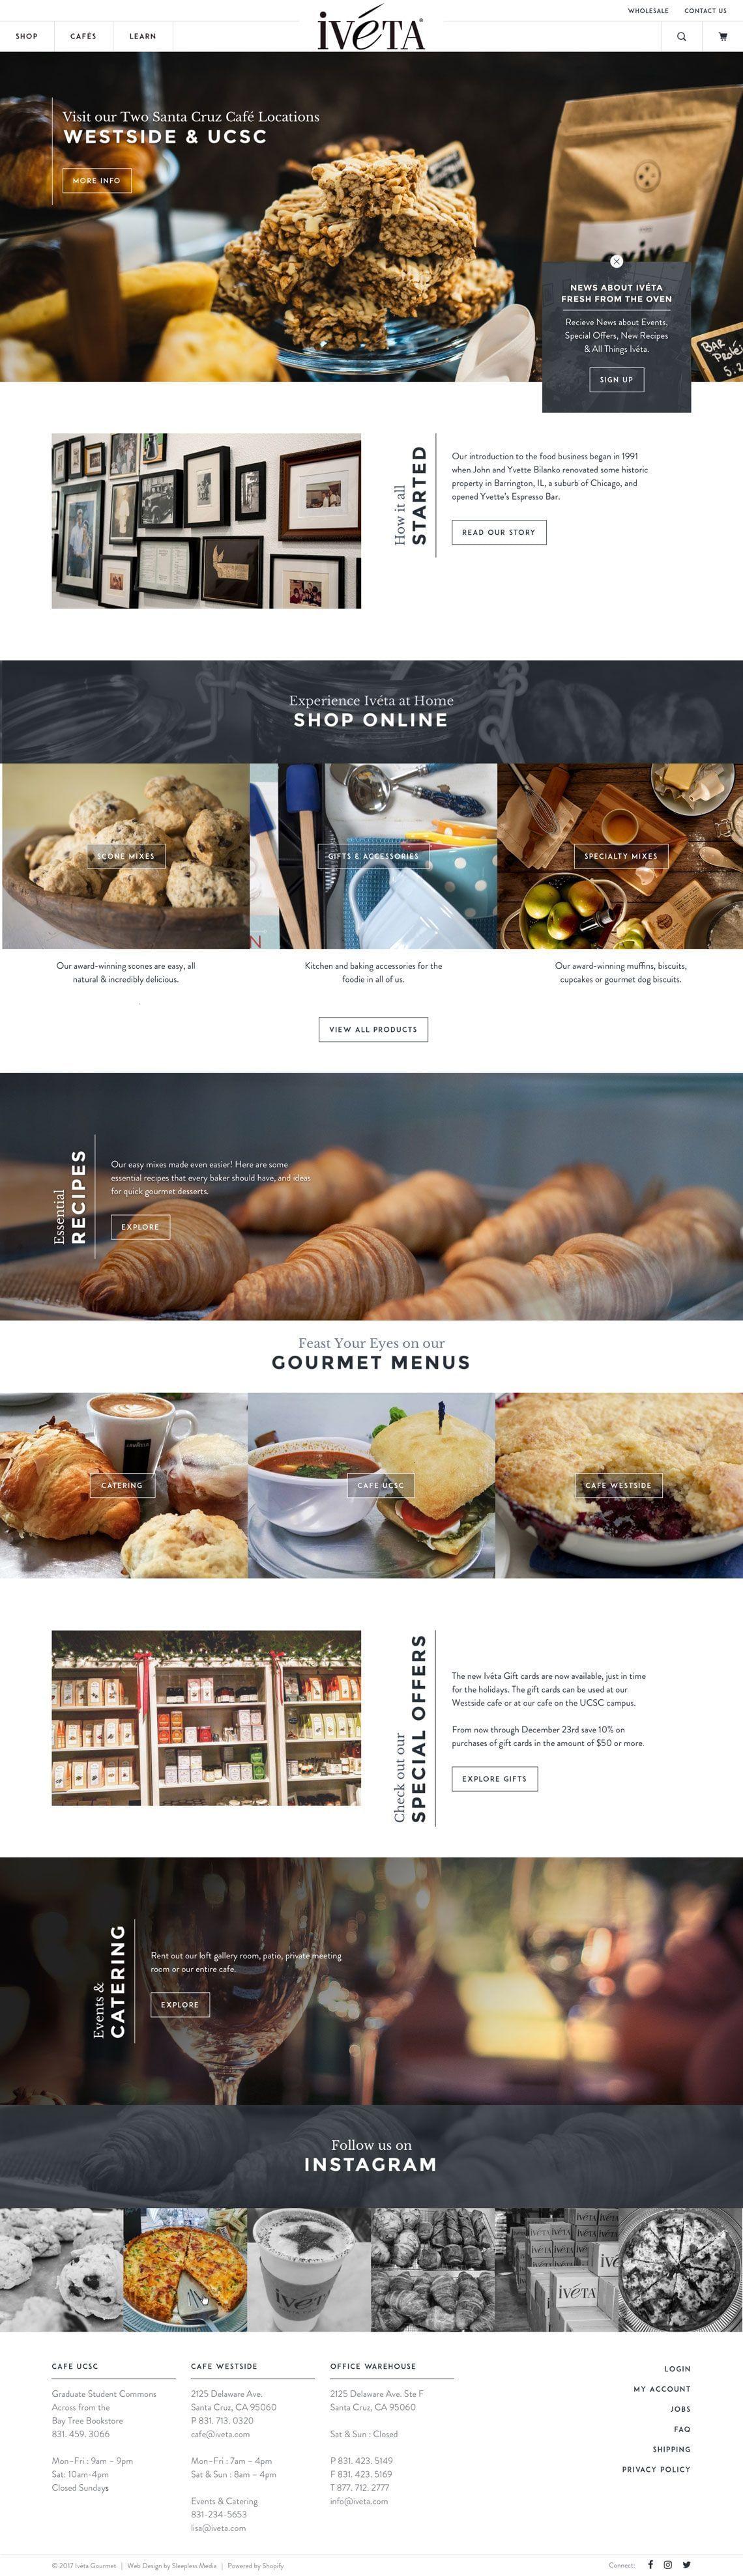 Iveta Homepage